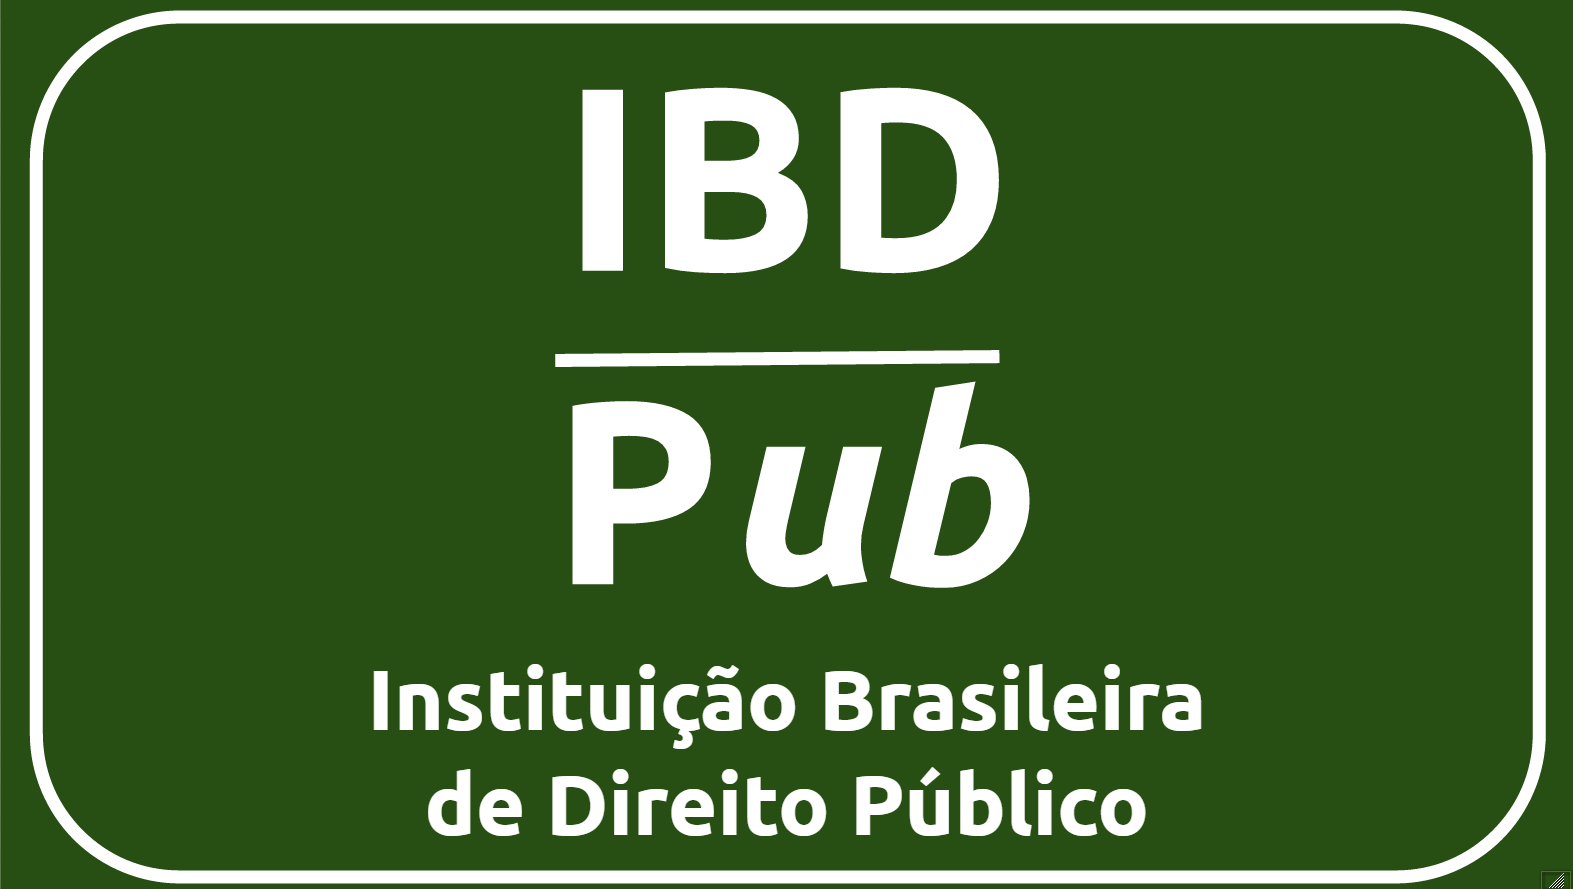 IBDPub